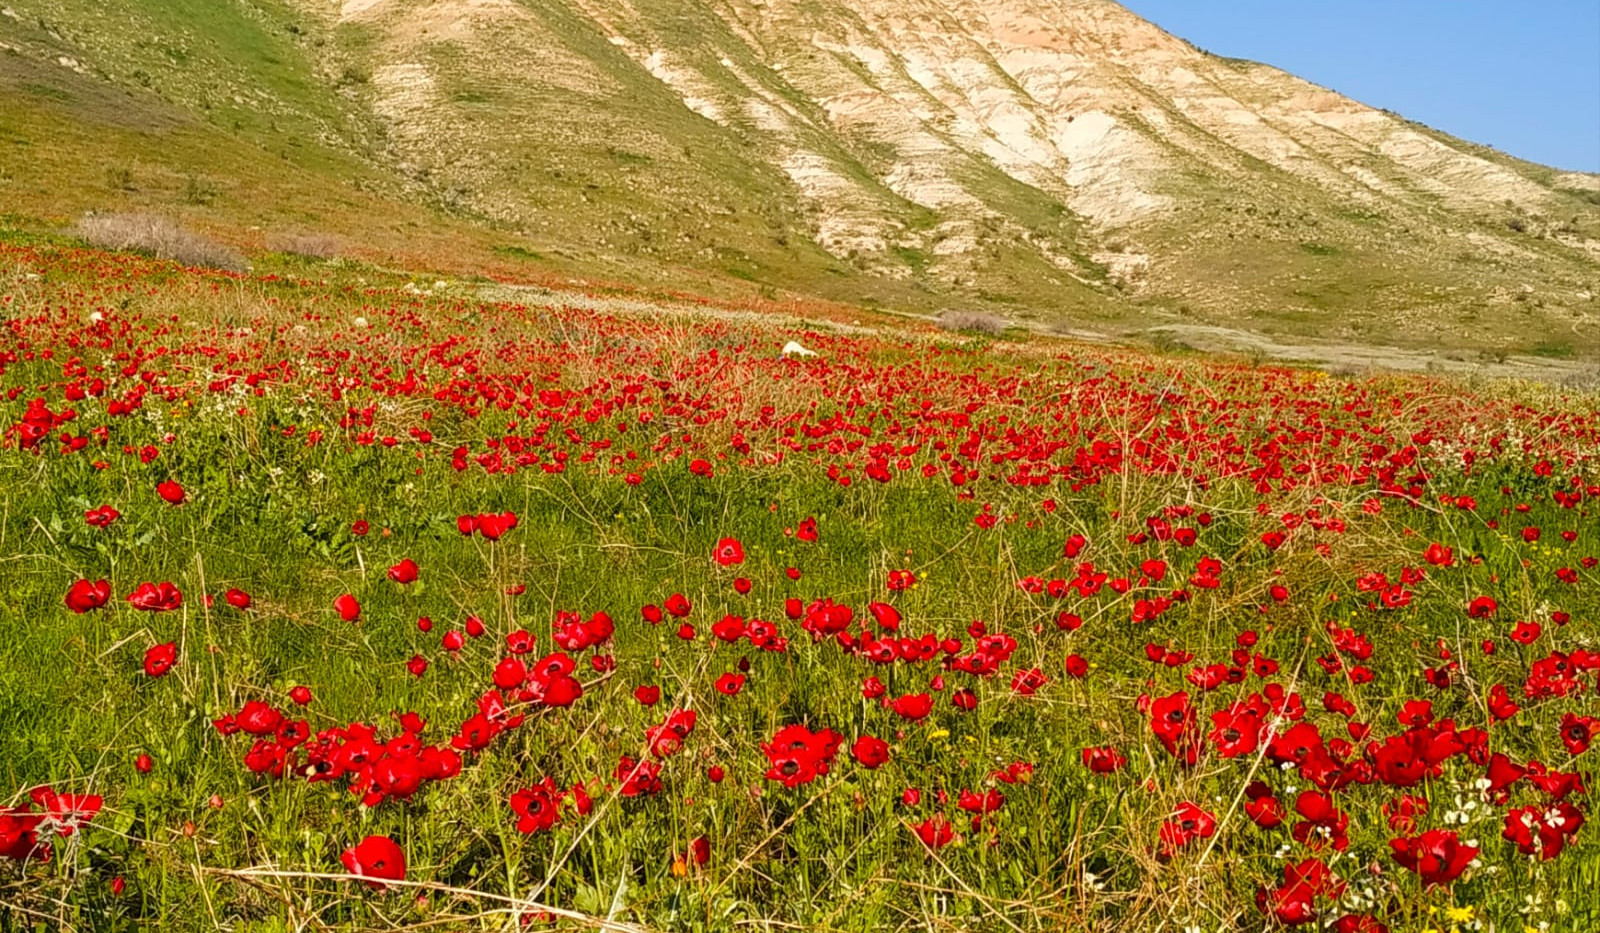 Buttercup in the Jorden Valley